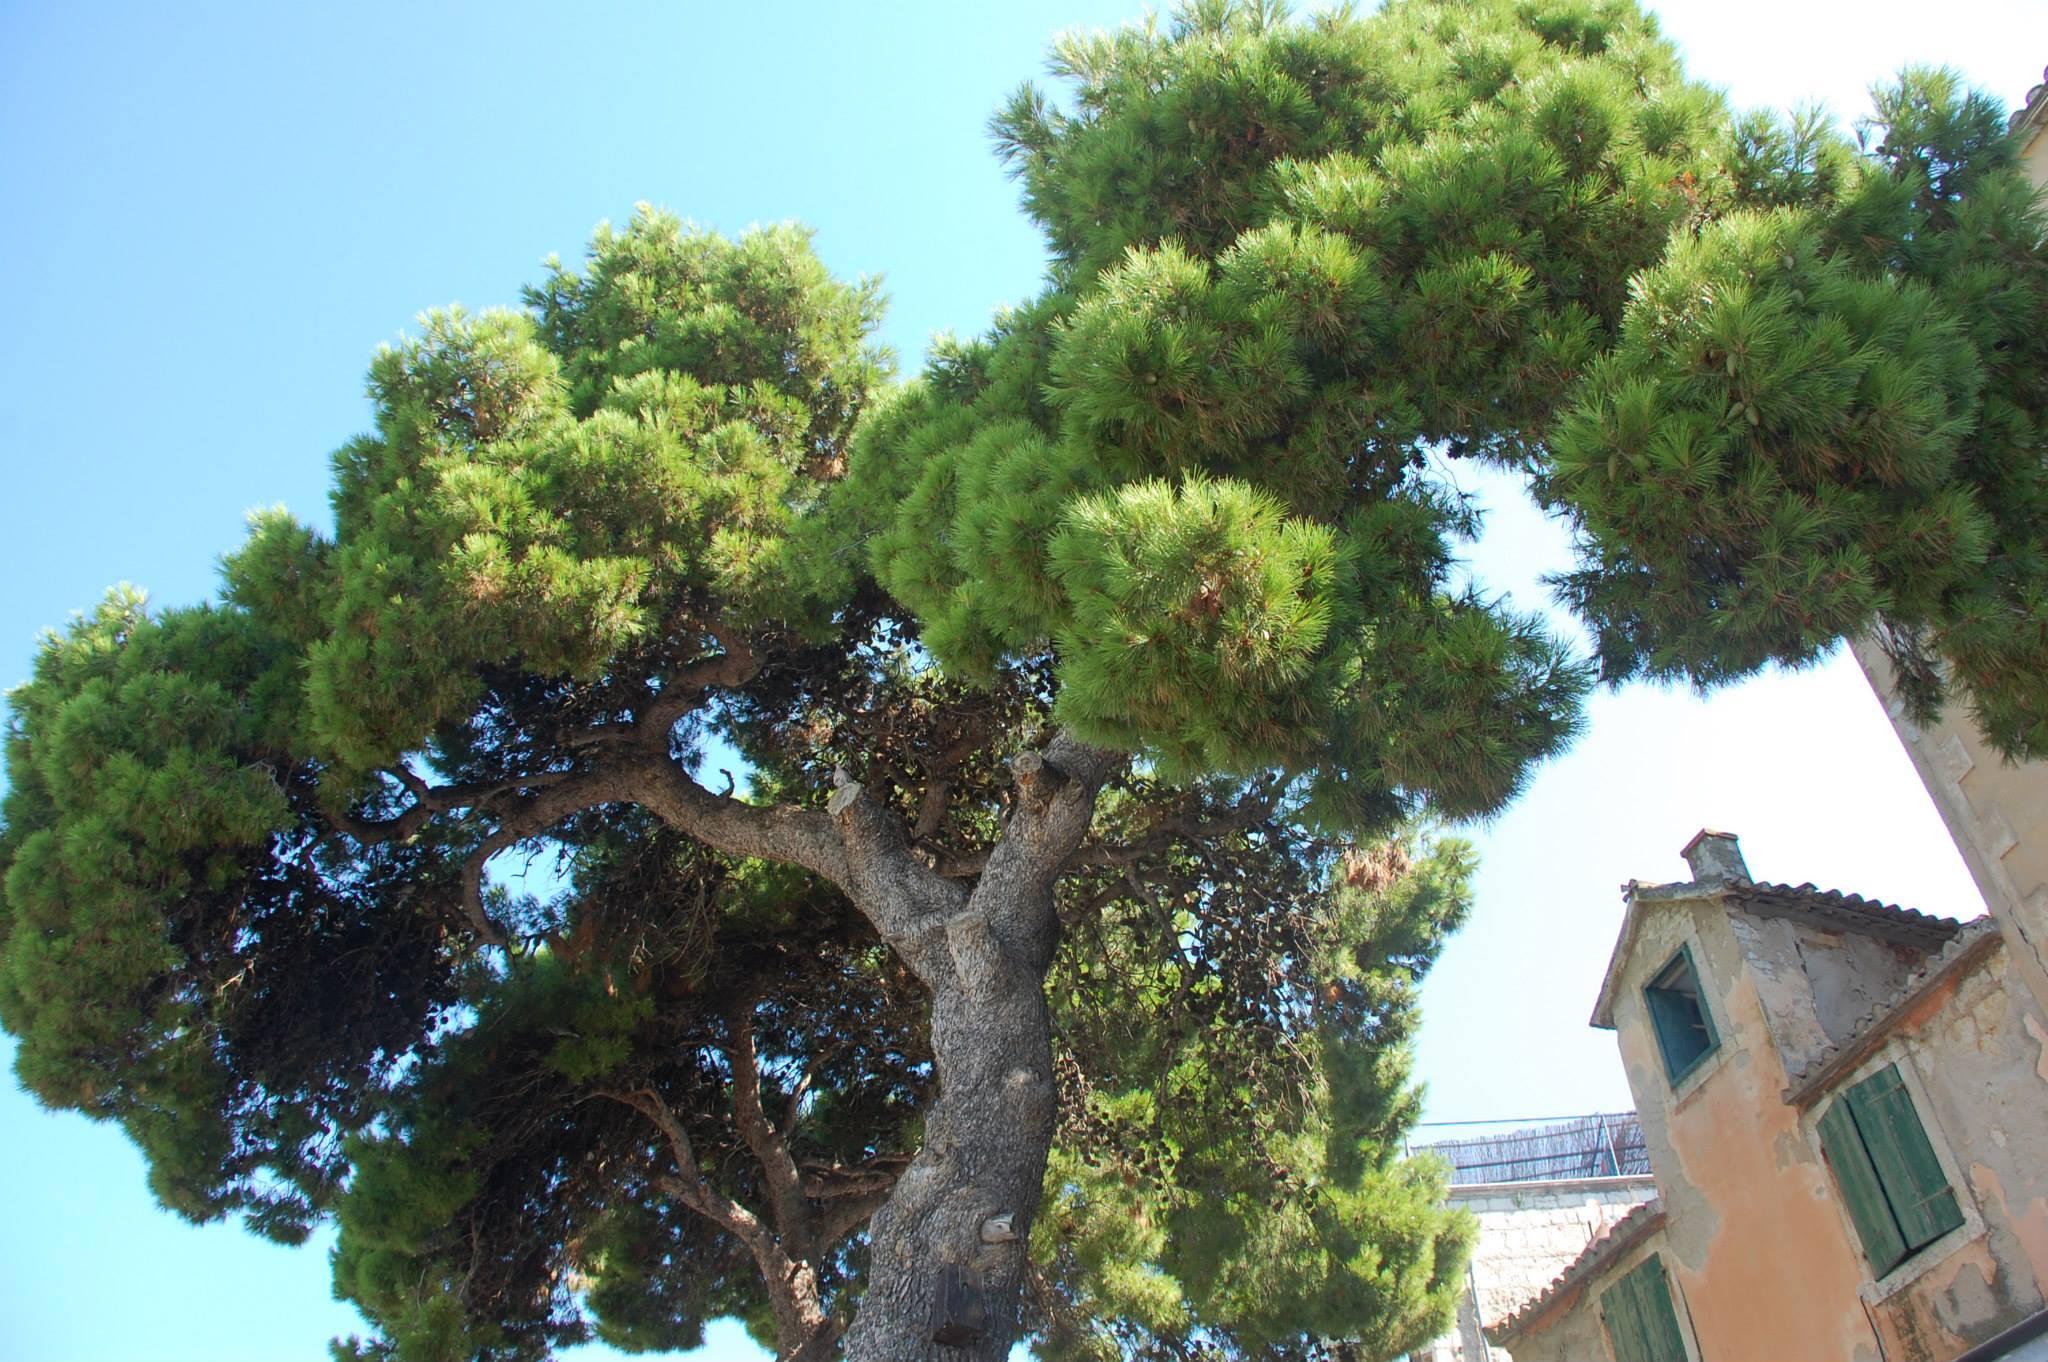 Croatian Specialty : Damalt Pines